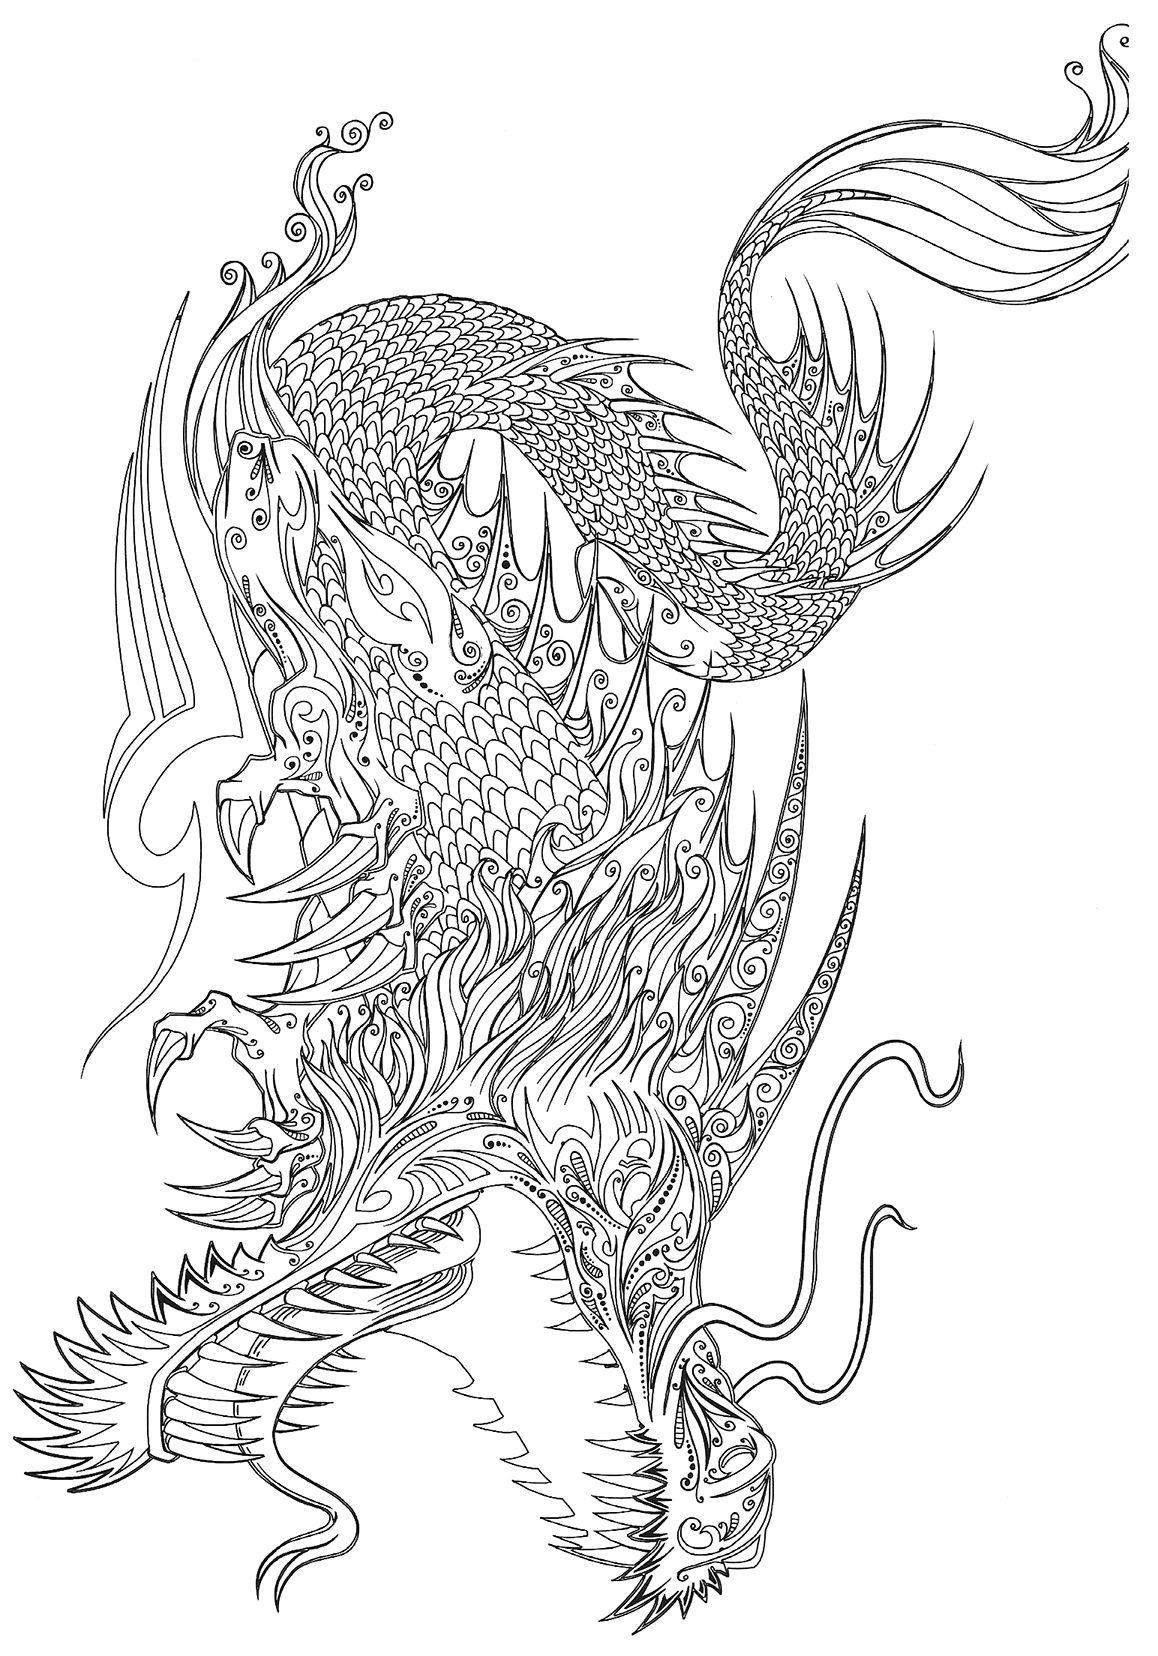 Tatouage Dragon Chinois A Colorier T Pinterest Coloring Pages